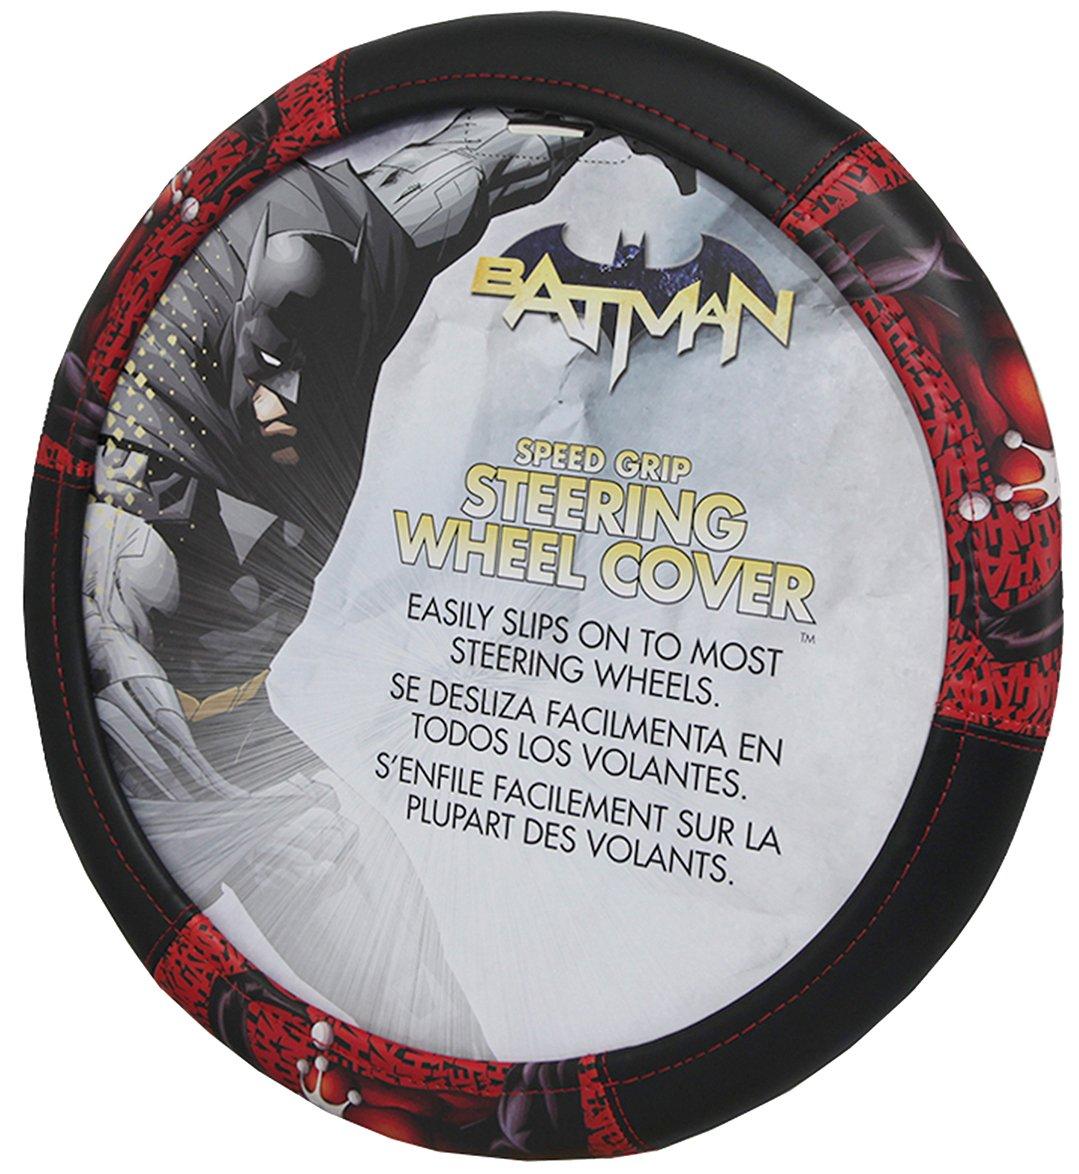 Plasticolor 006758R01 Ha Speed Grip Steering Wheel Cover